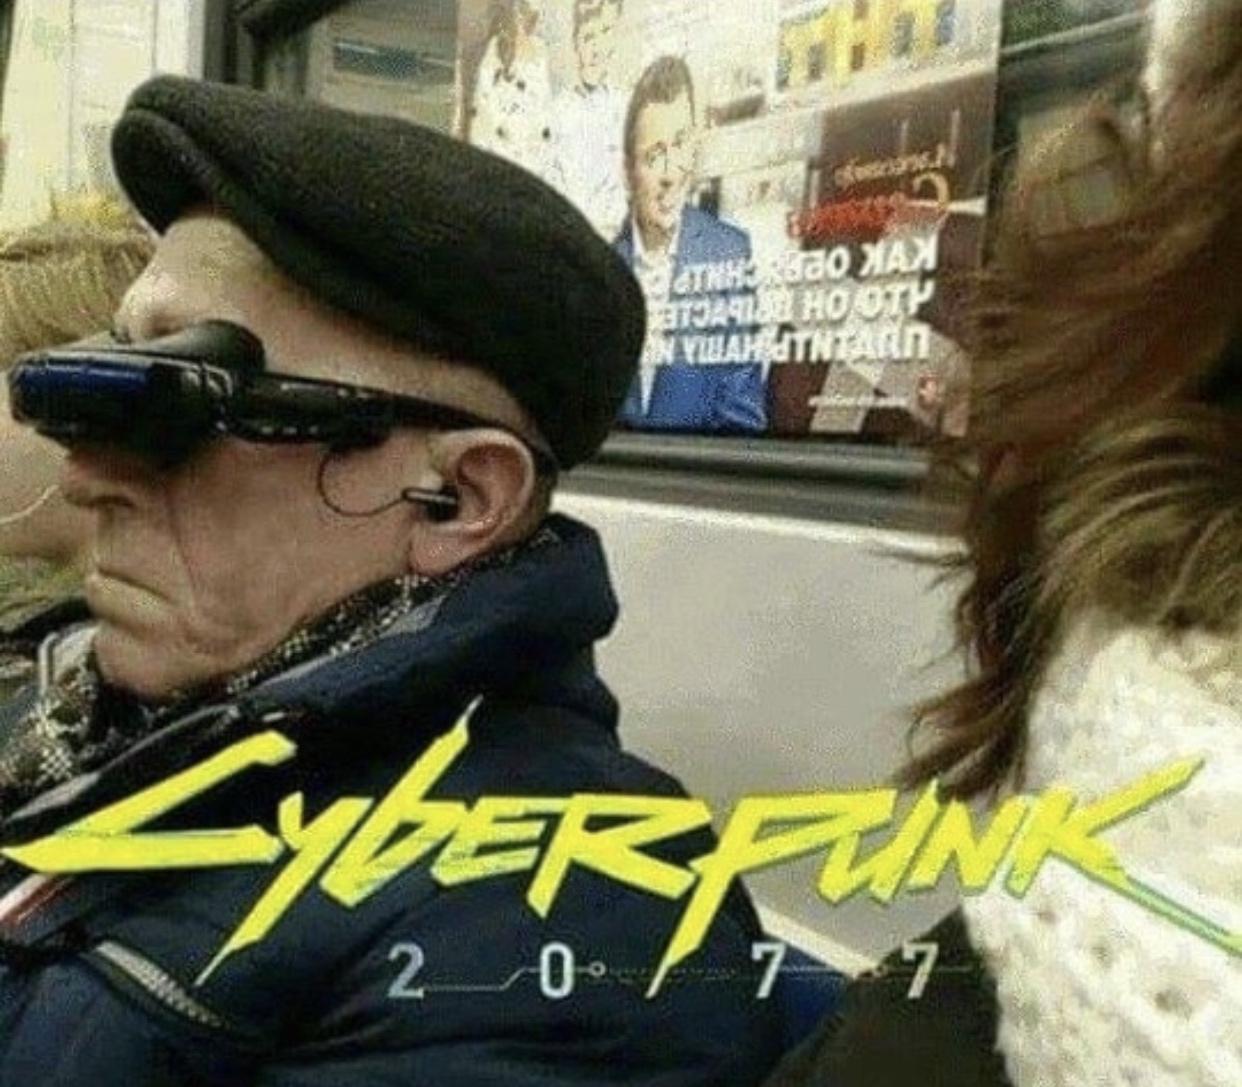 29 Cyberpunk 2077 Memes That Show People Using Technology ...